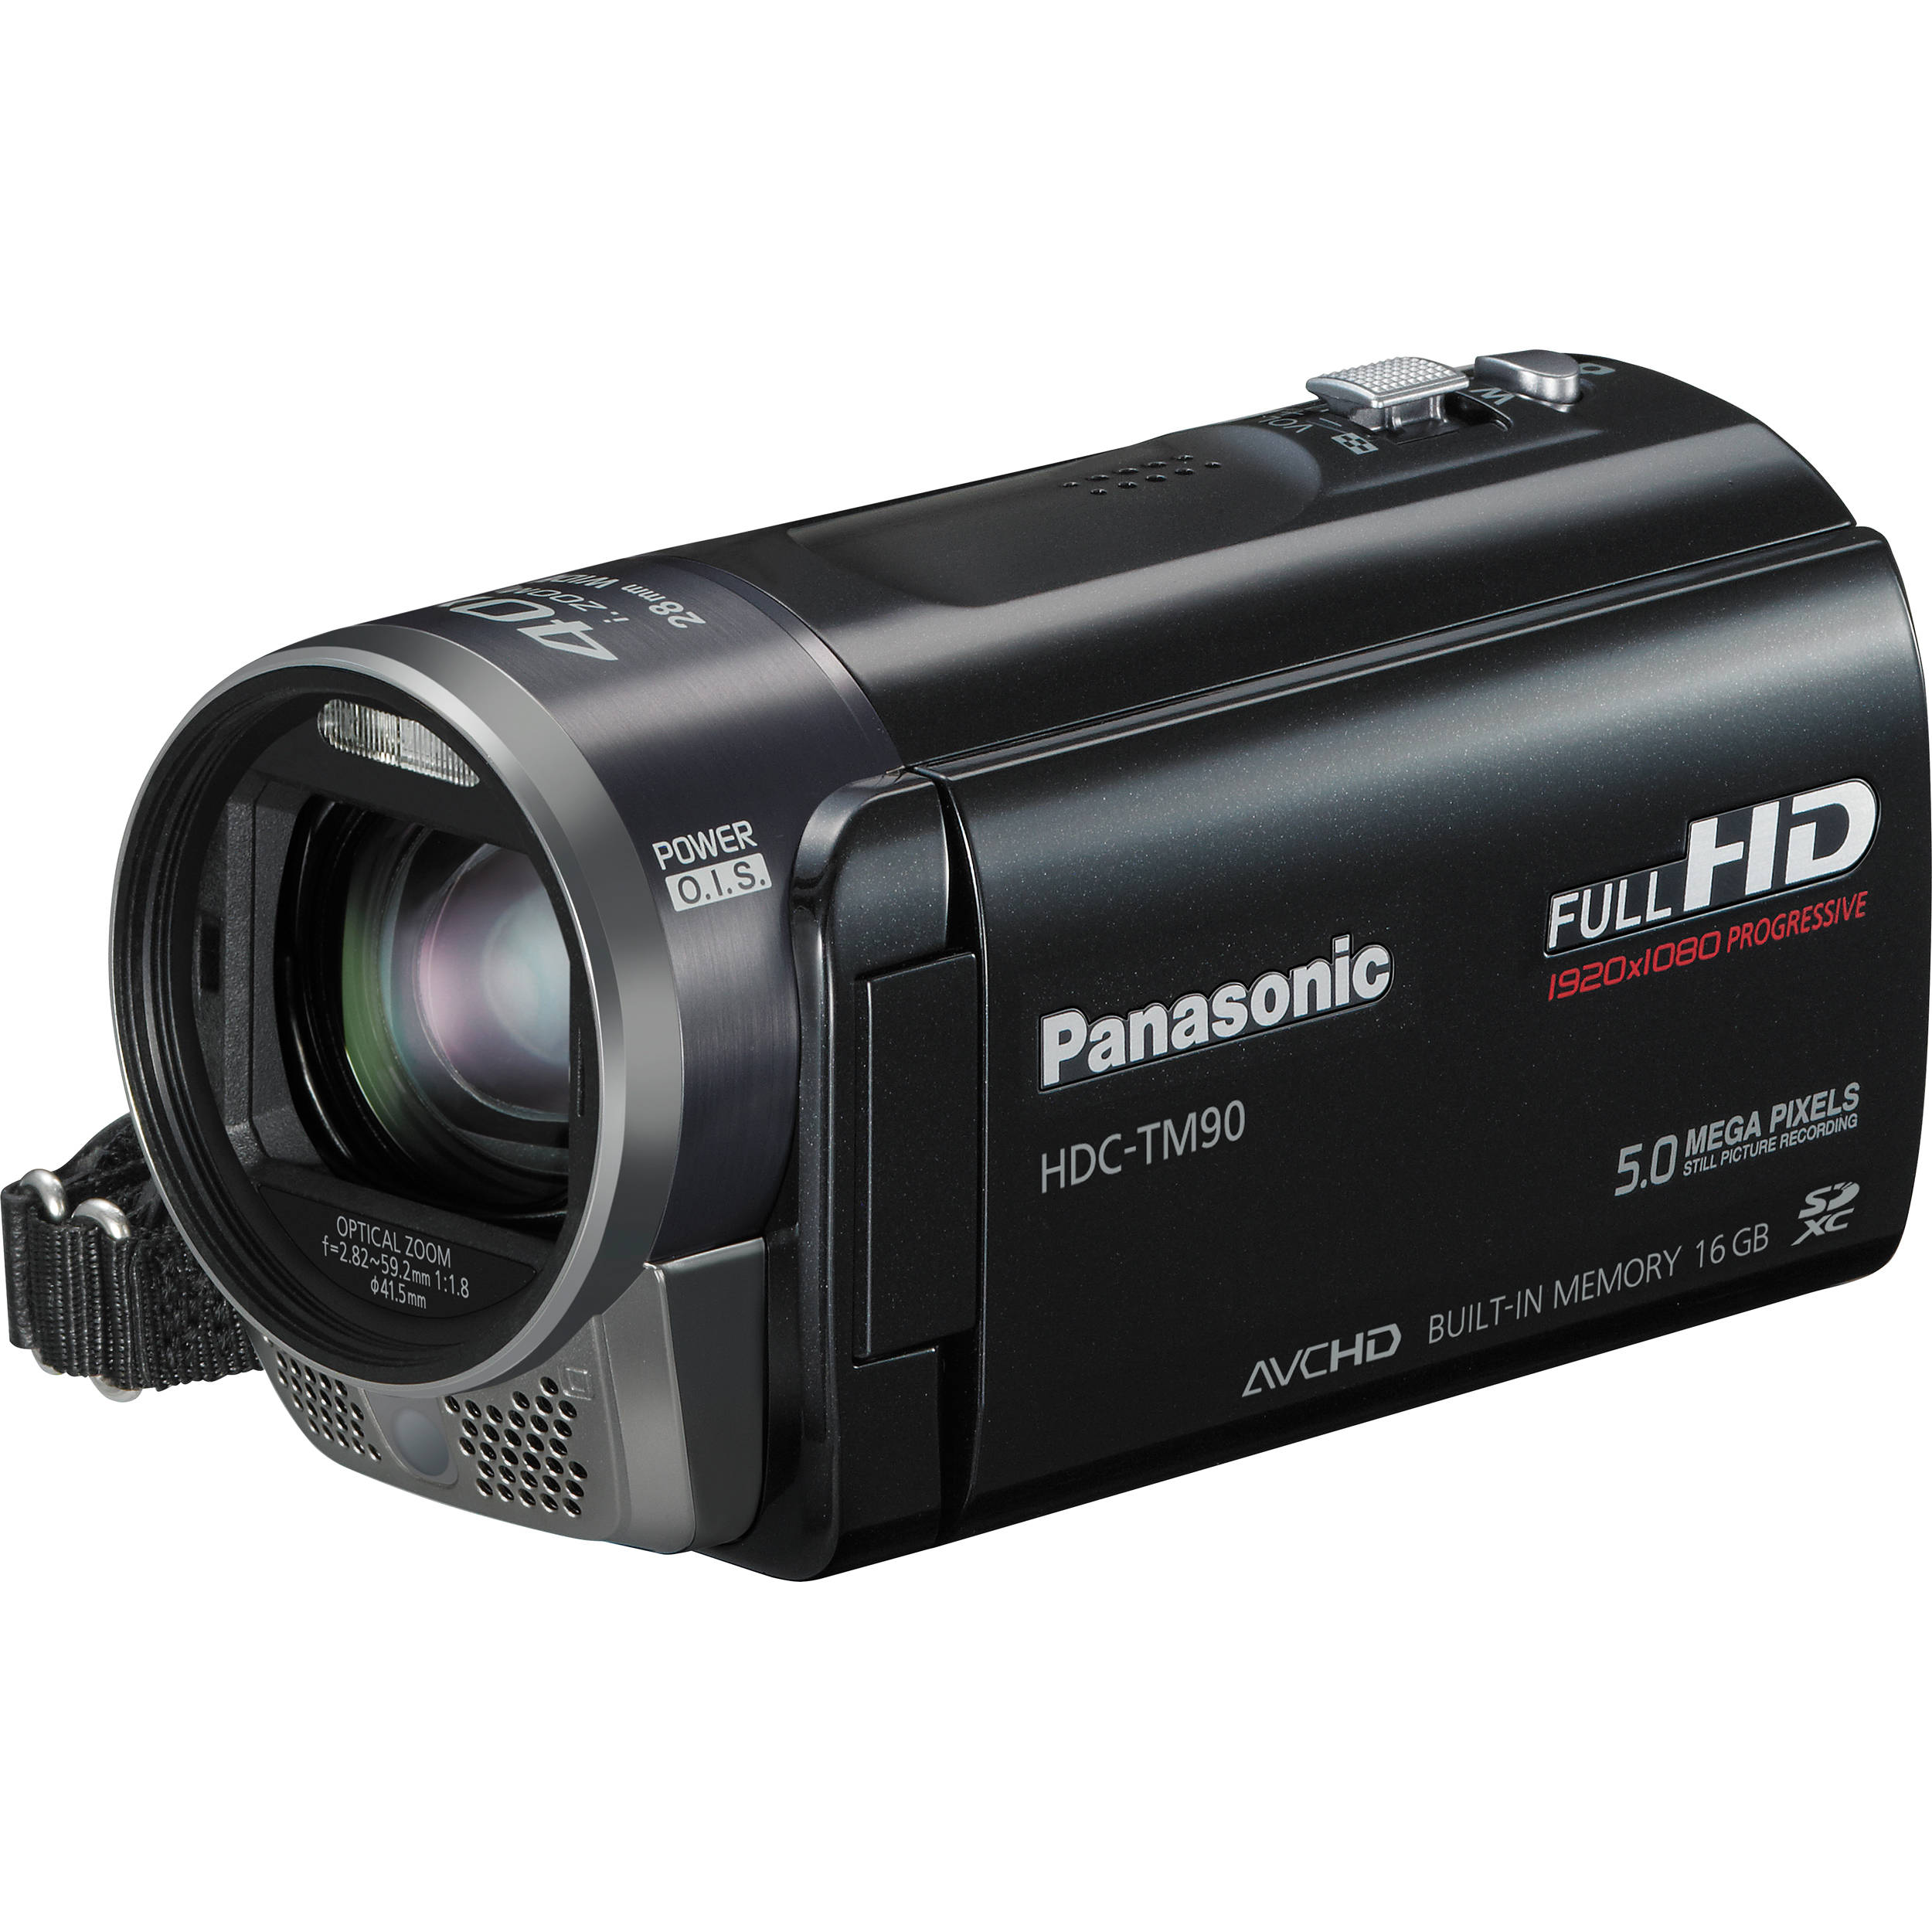 panasonic hdc tm90 high definition camcorder hdc tm90k b h photo rh bhphotovideo com Manual Panasonic Radio panasonic hdc-tm90 manual